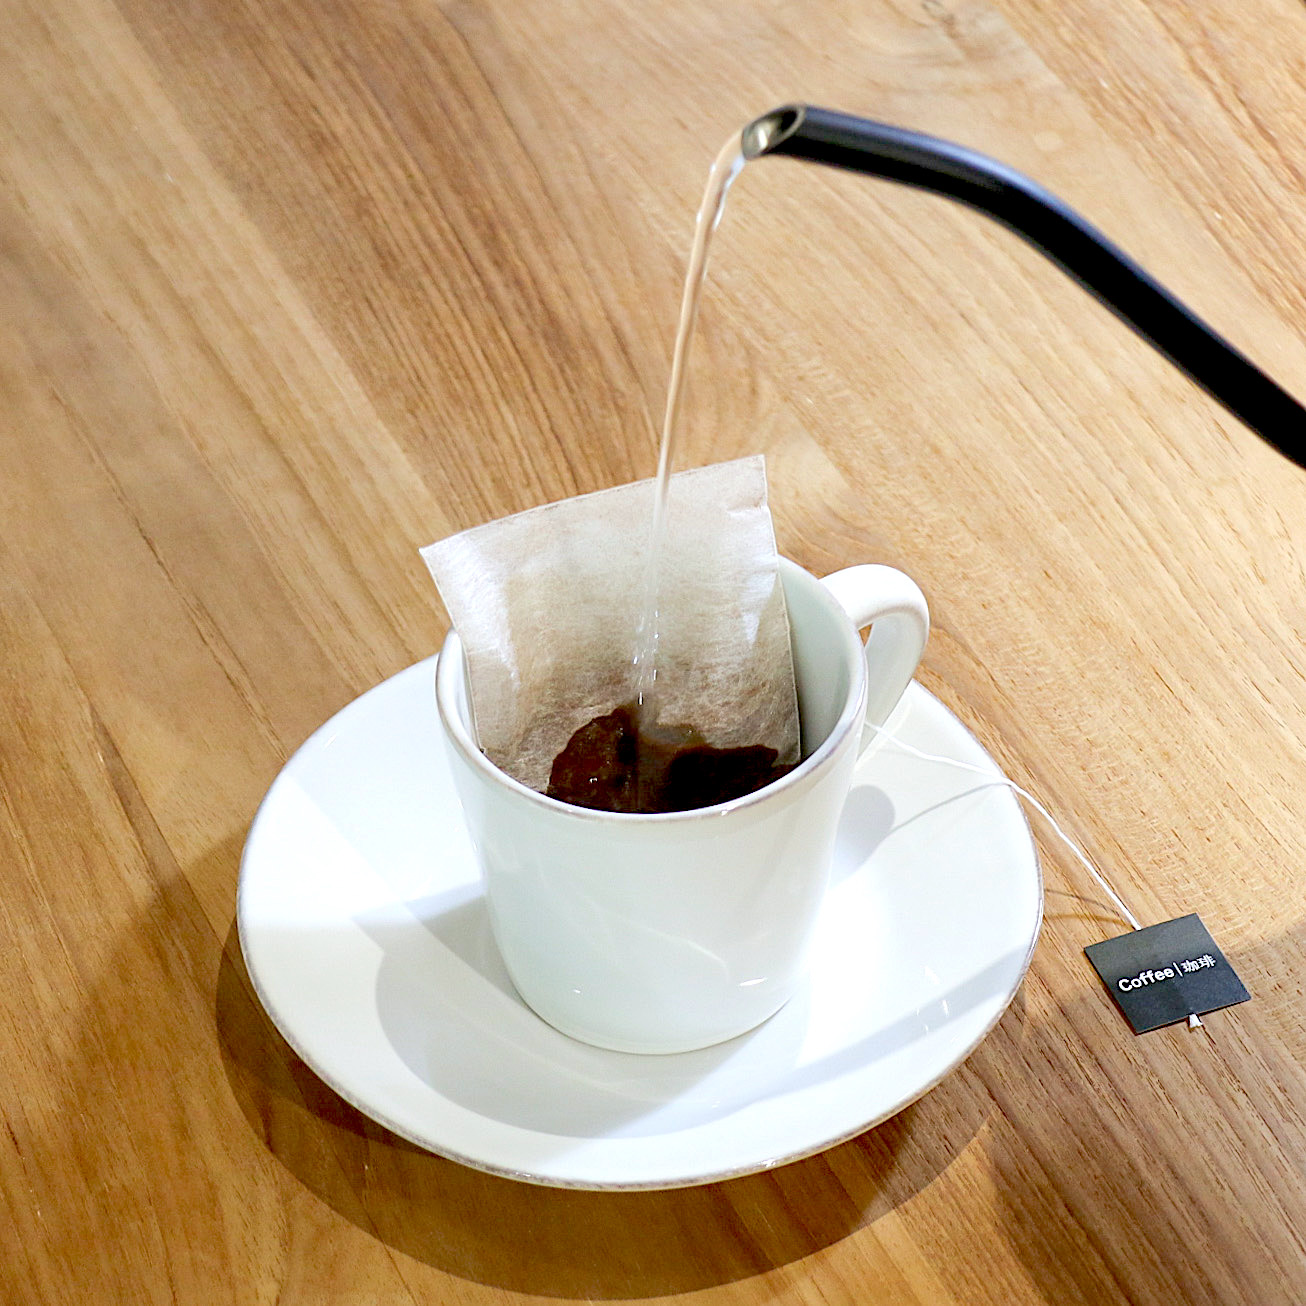 BEMO Café 居家防疫25入職人單品咖啡浸泡包 抗疫優惠組